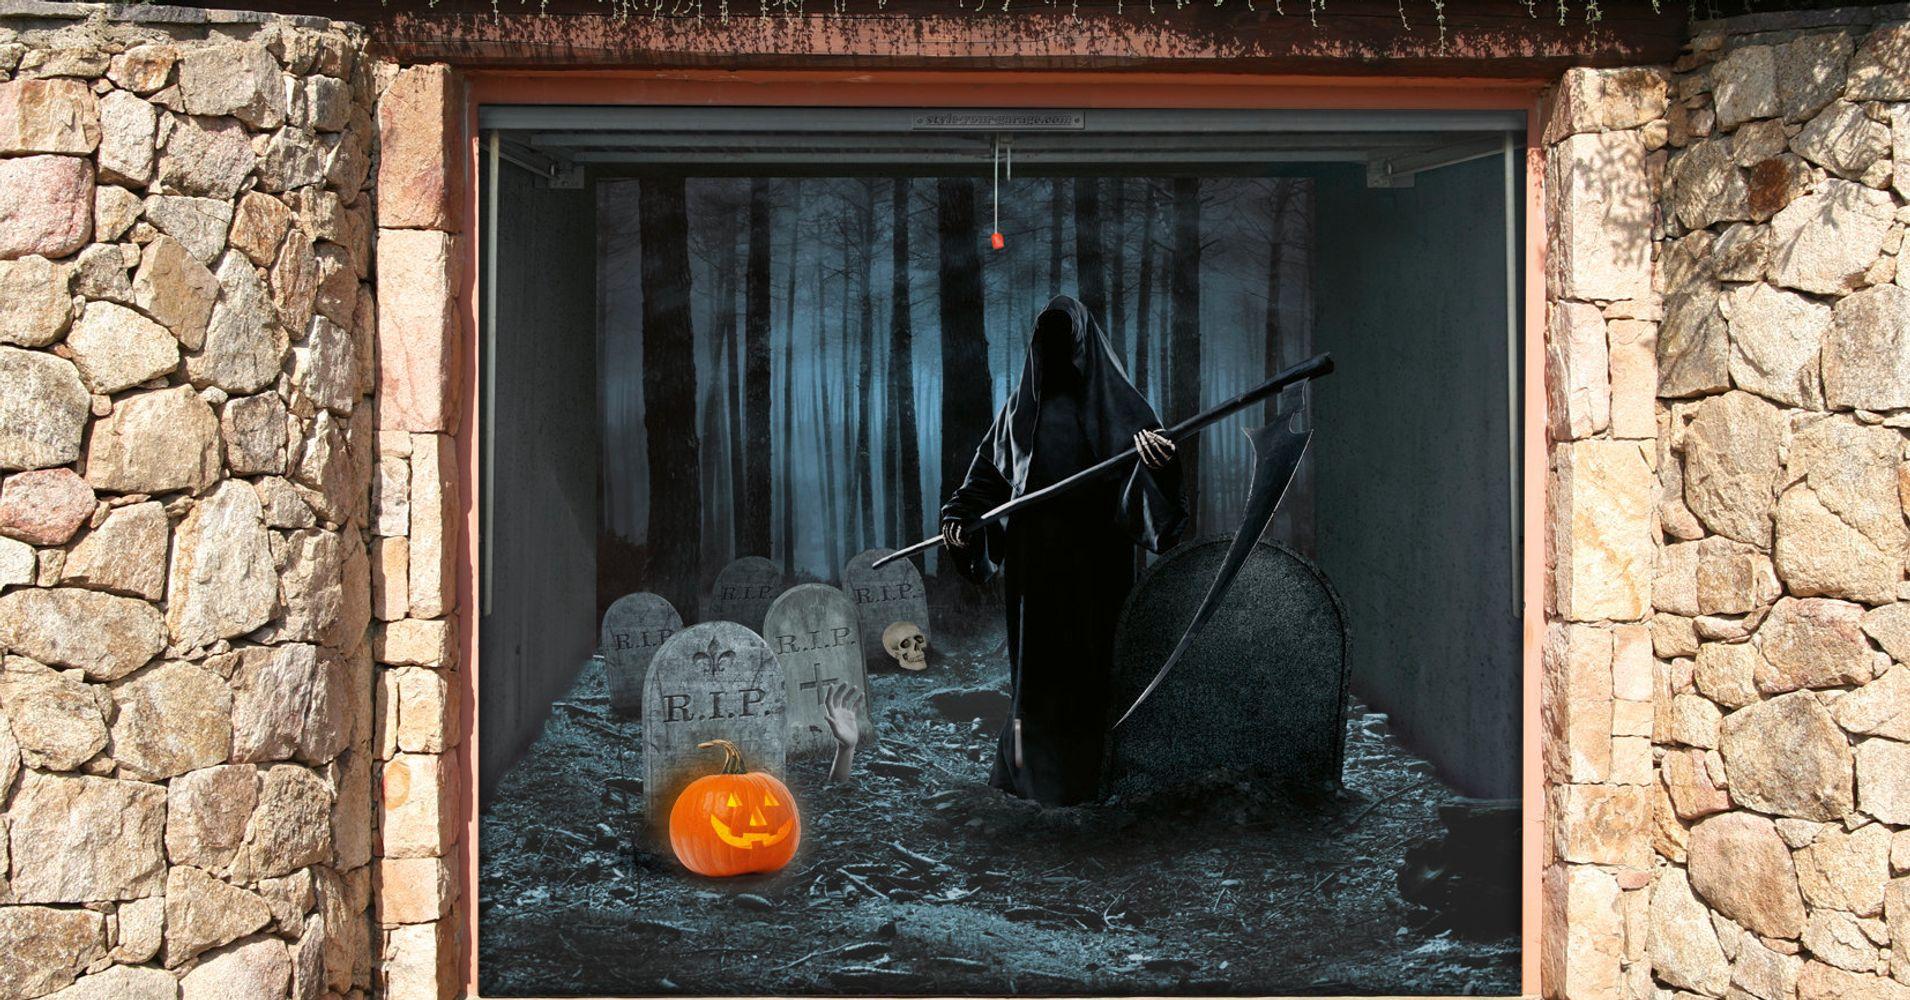 These Spooky Garage Door Stickers Are What Halloween Is